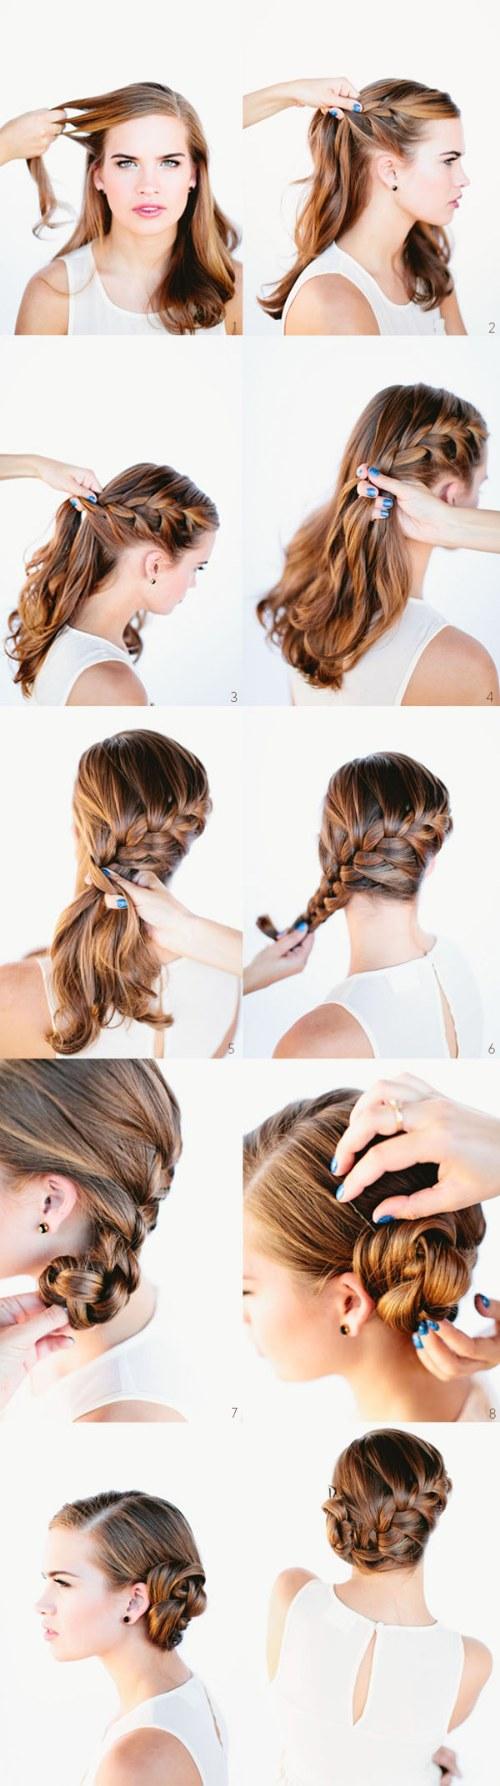 10 peinados lindos paso a paso de trenzados para el - Peinados bonitos paso a paso ...